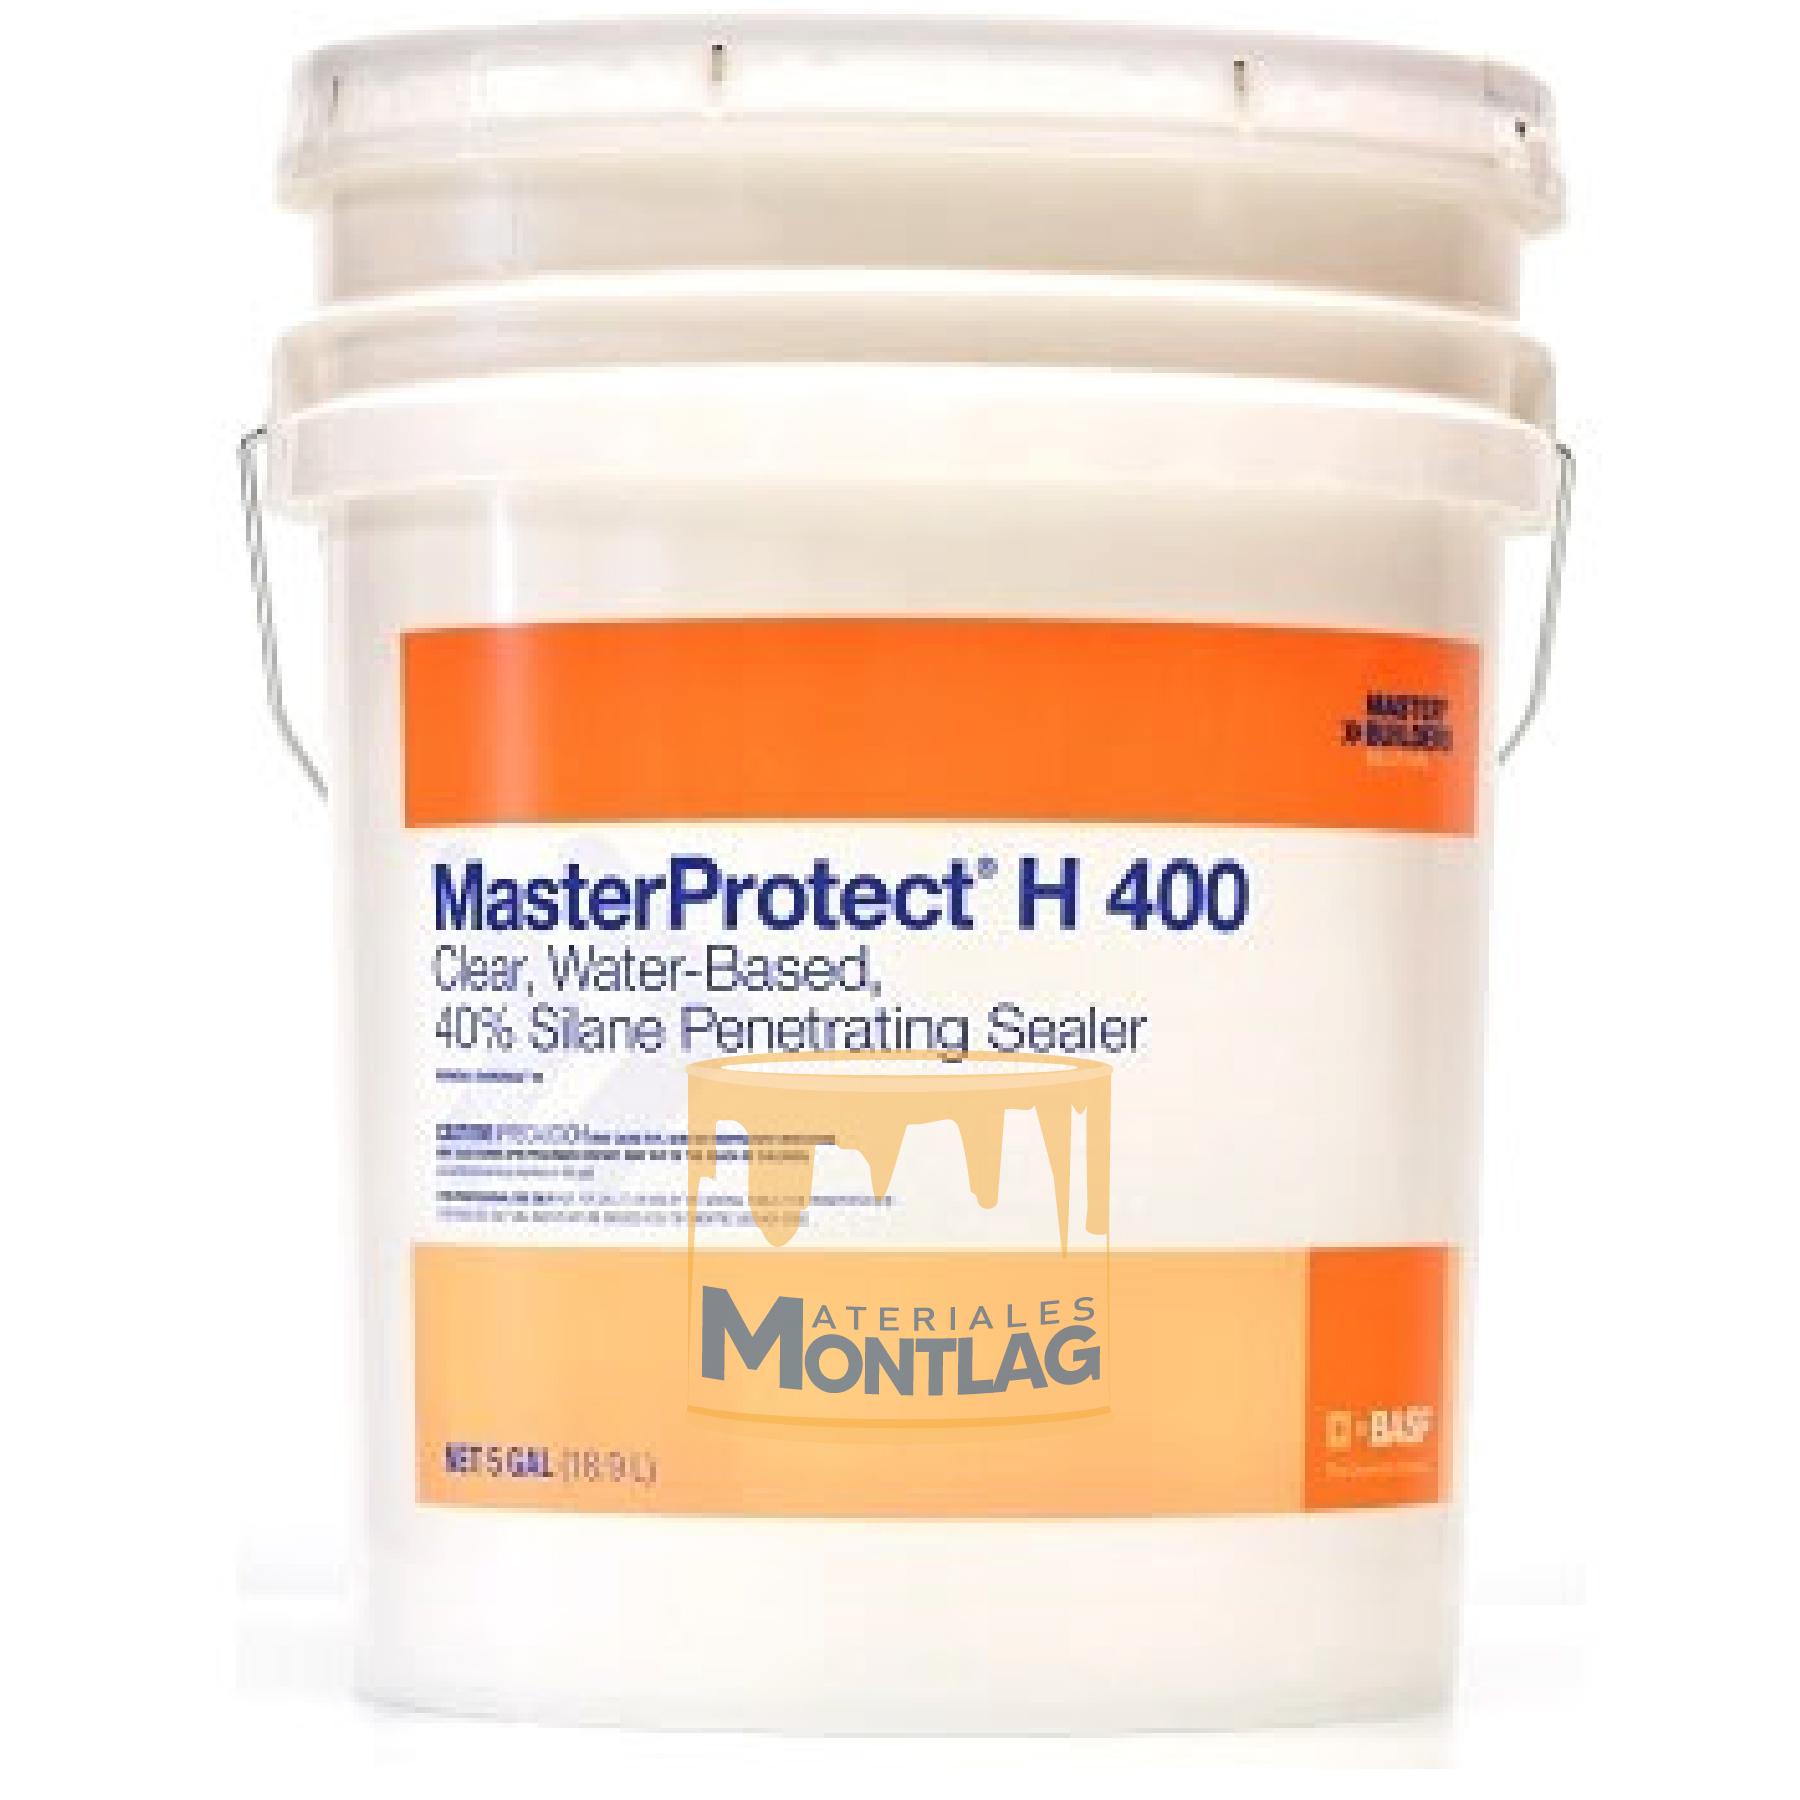 MasterProtect H 400 5 Gal